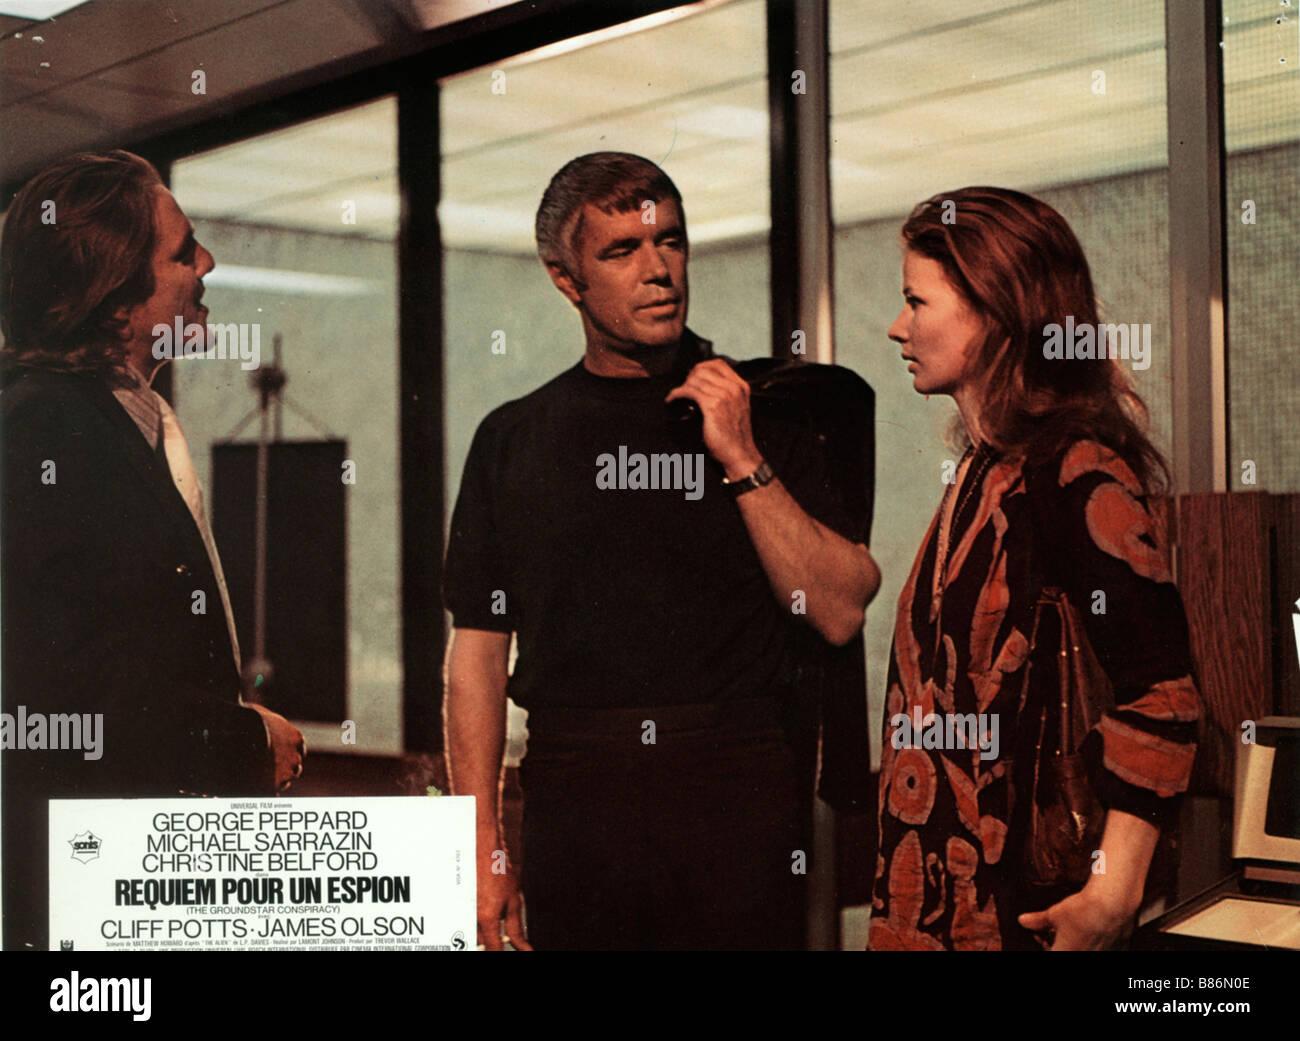 Jason St. Amour,Fefe Dobson XXX gallery Eloise Mumford,Carla Collins